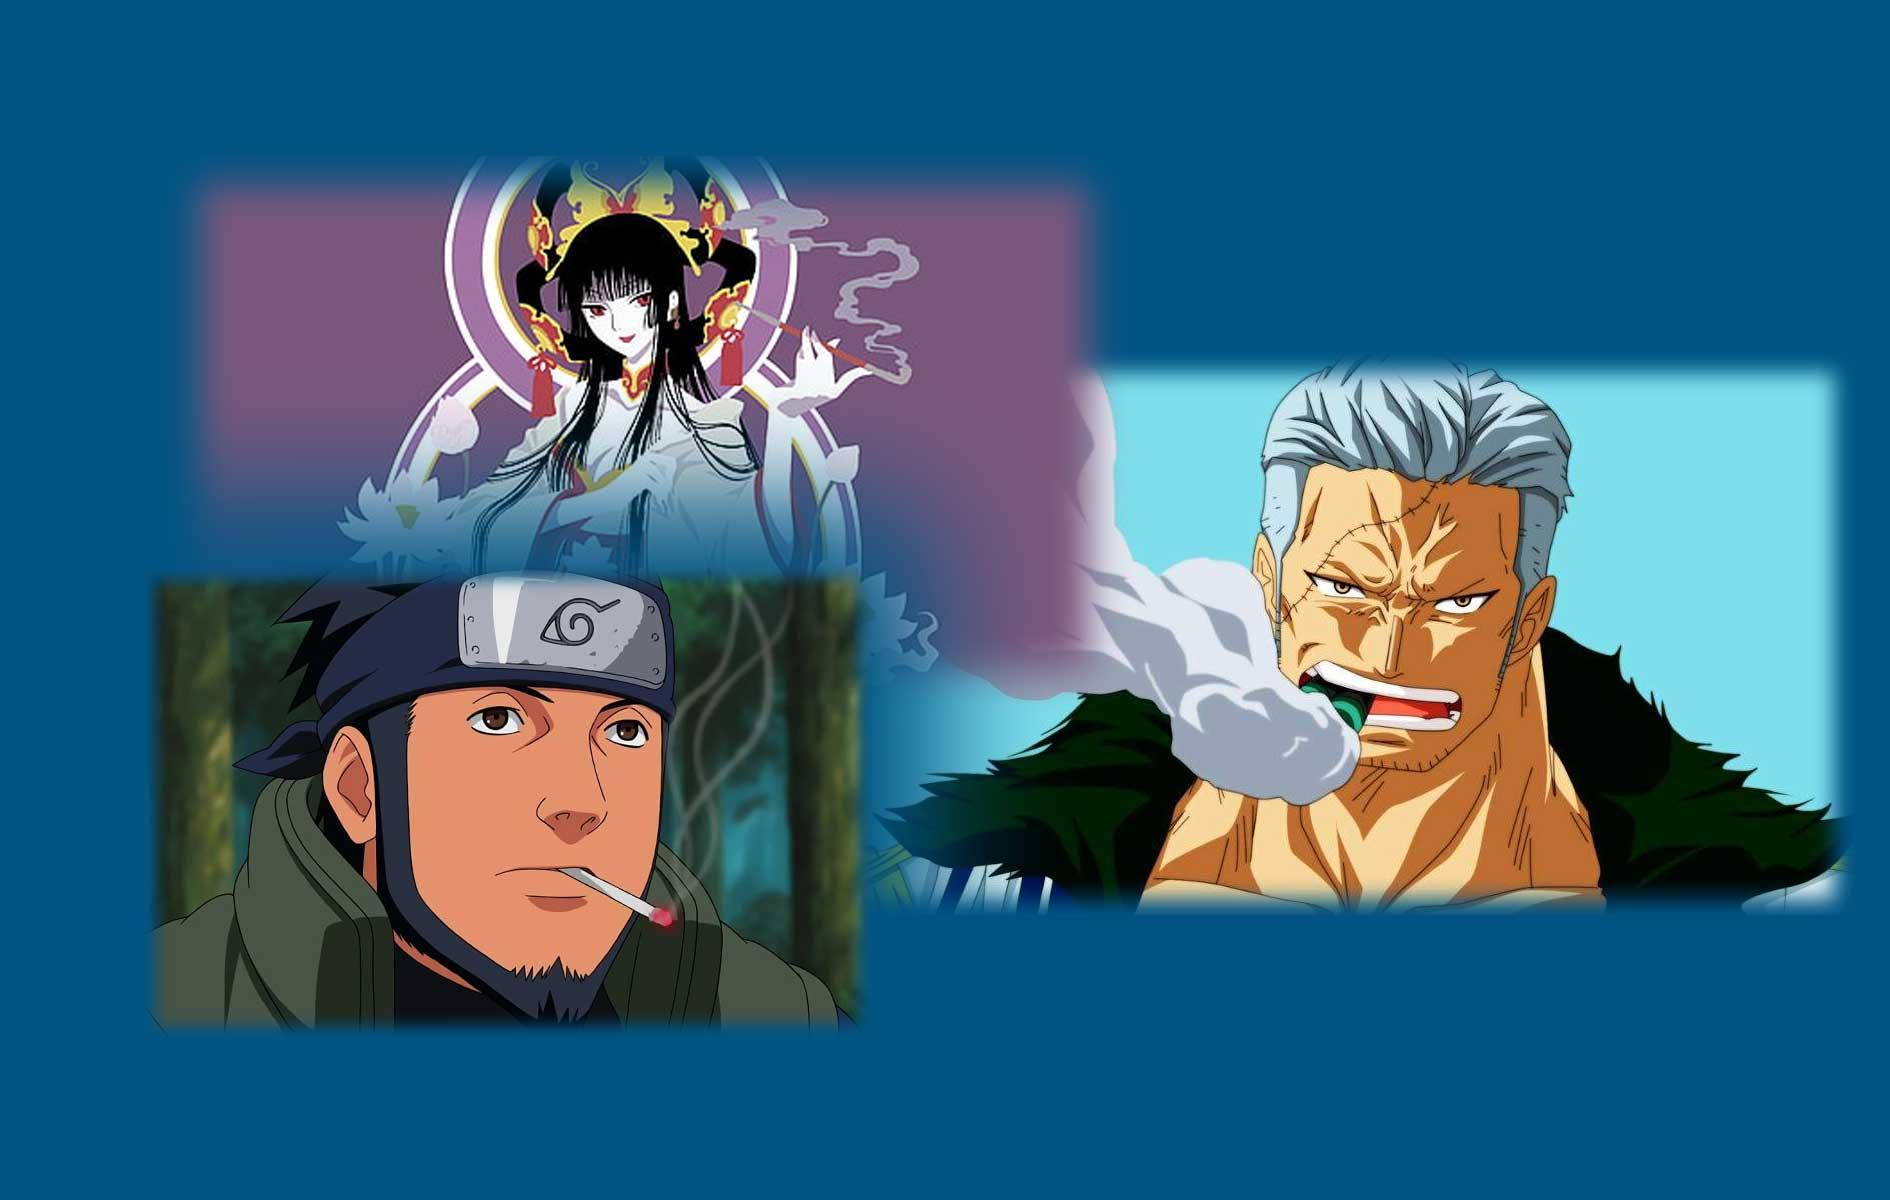 Mejores personajes del anime que fuman